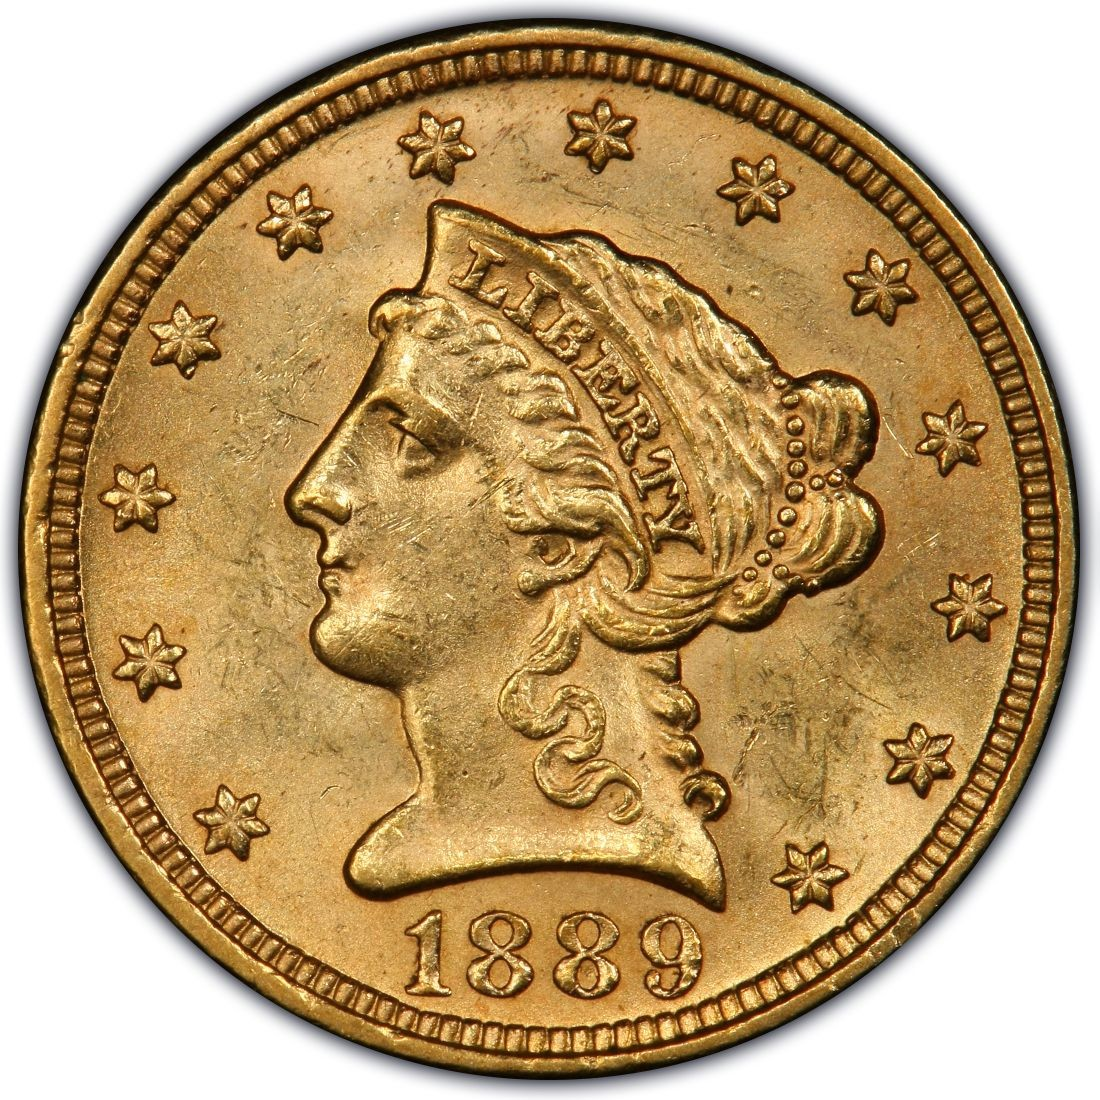 1889 Liberty Head 2 50 Gold Quarter Eagle Coin Values And